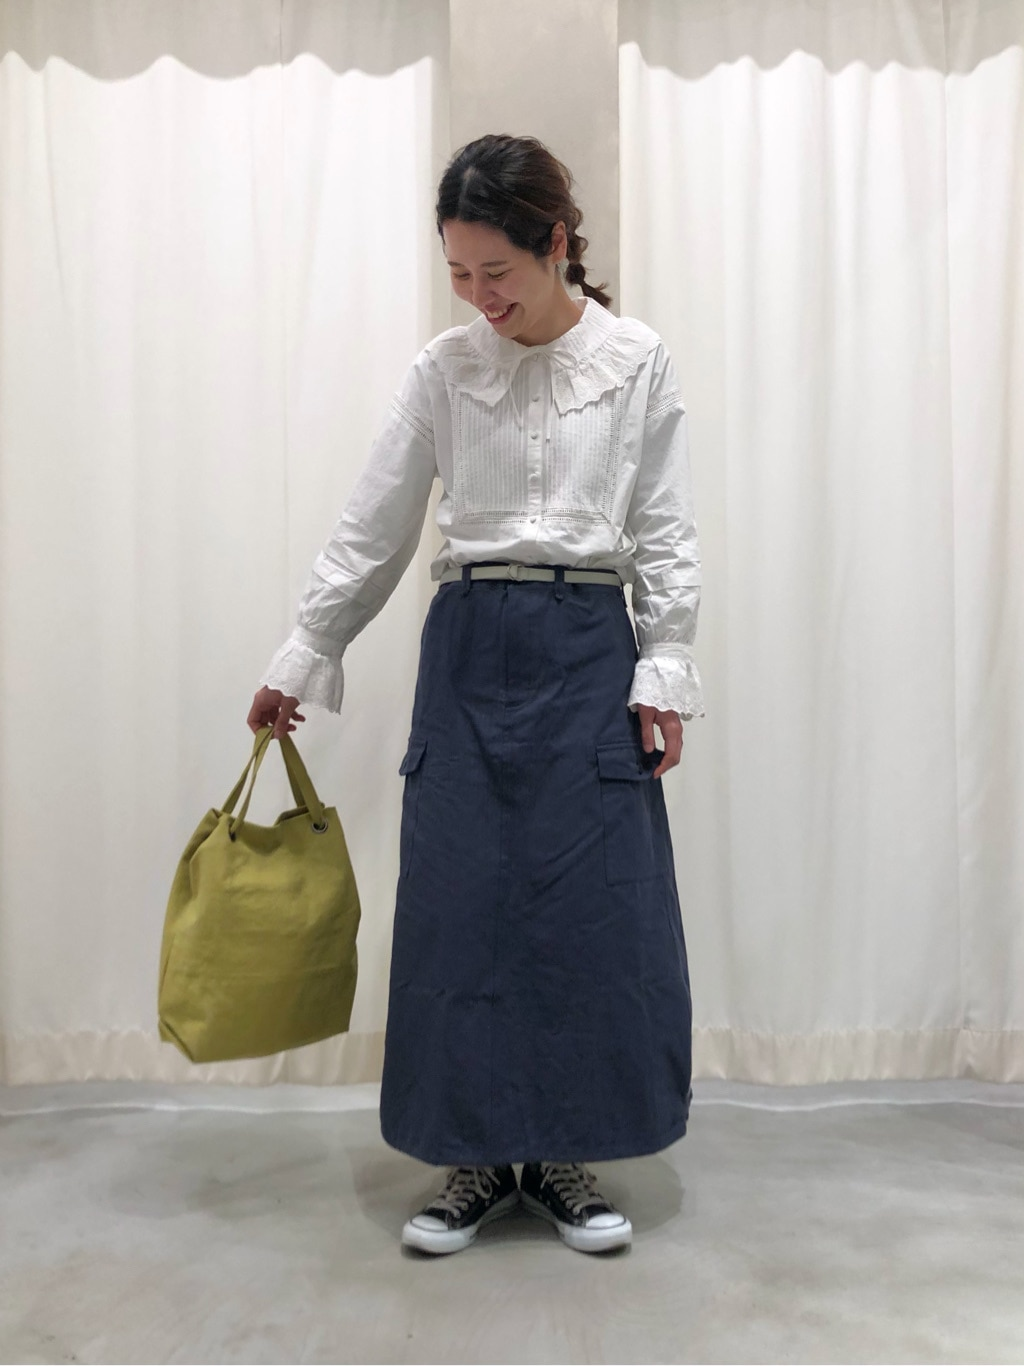 - CHILD WOMAN CHILD WOMAN , PAR ICI 東京スカイツリータウン・ソラマチ 身長:160cm 2021.02.12